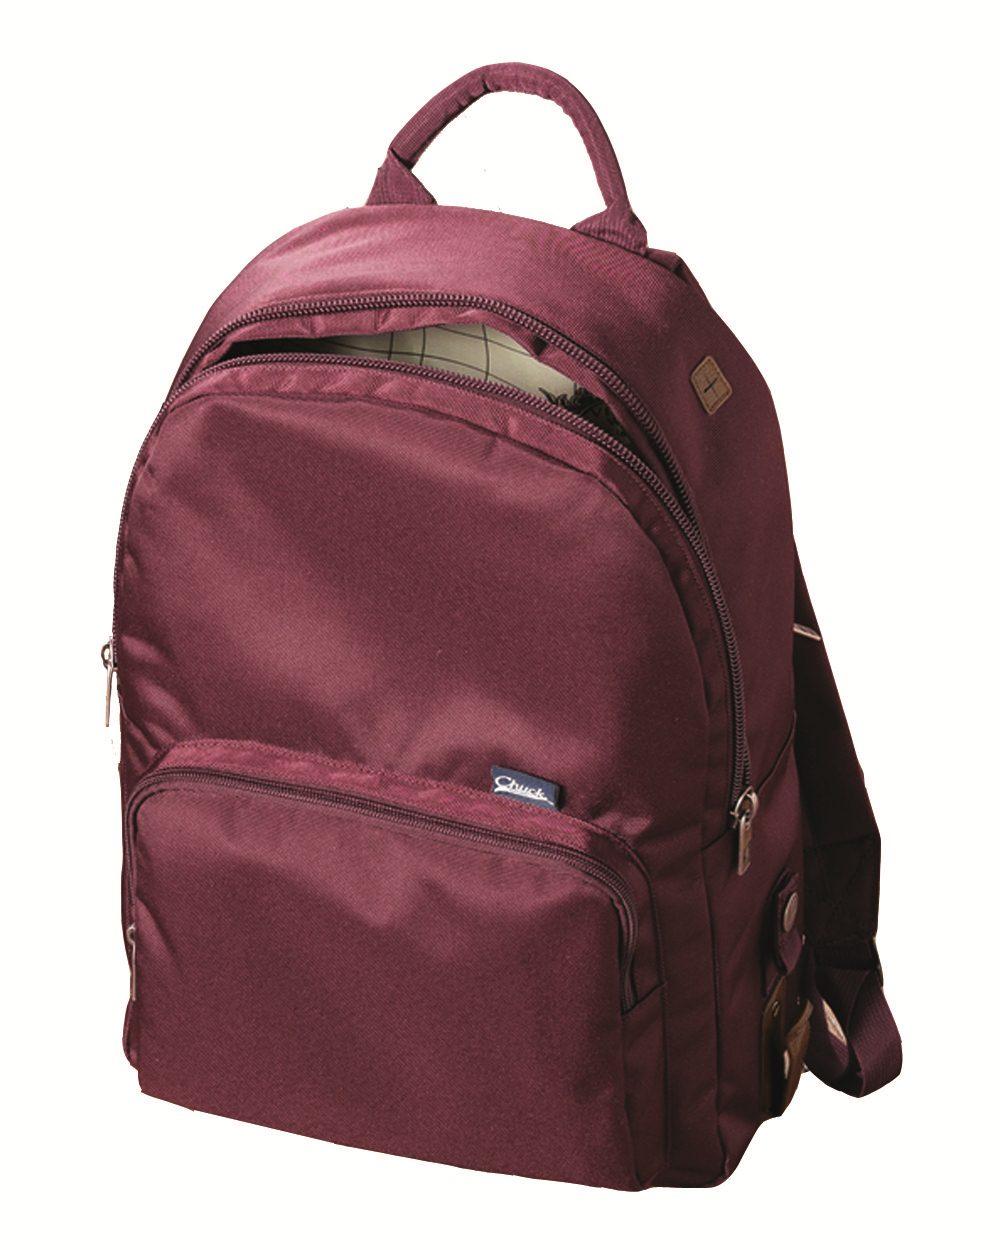 Original Chuck Classic Backpack - 28744